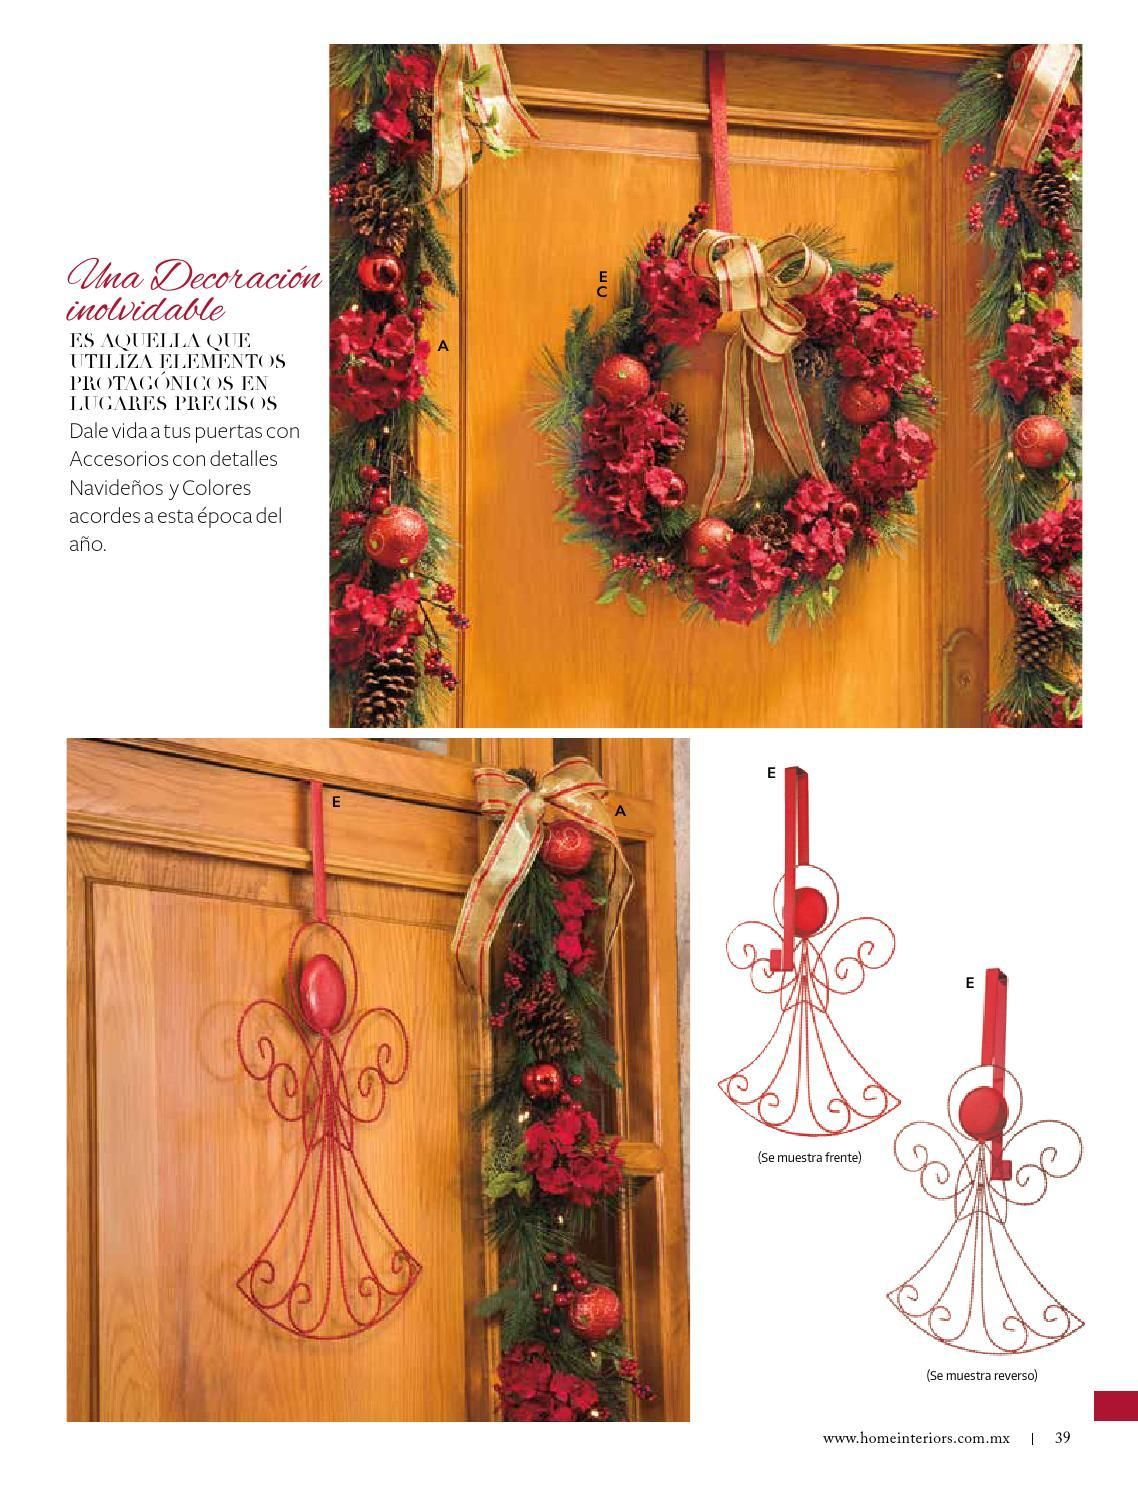 Clippedonissuu From Home Interiors Catálogo Navidad 2016